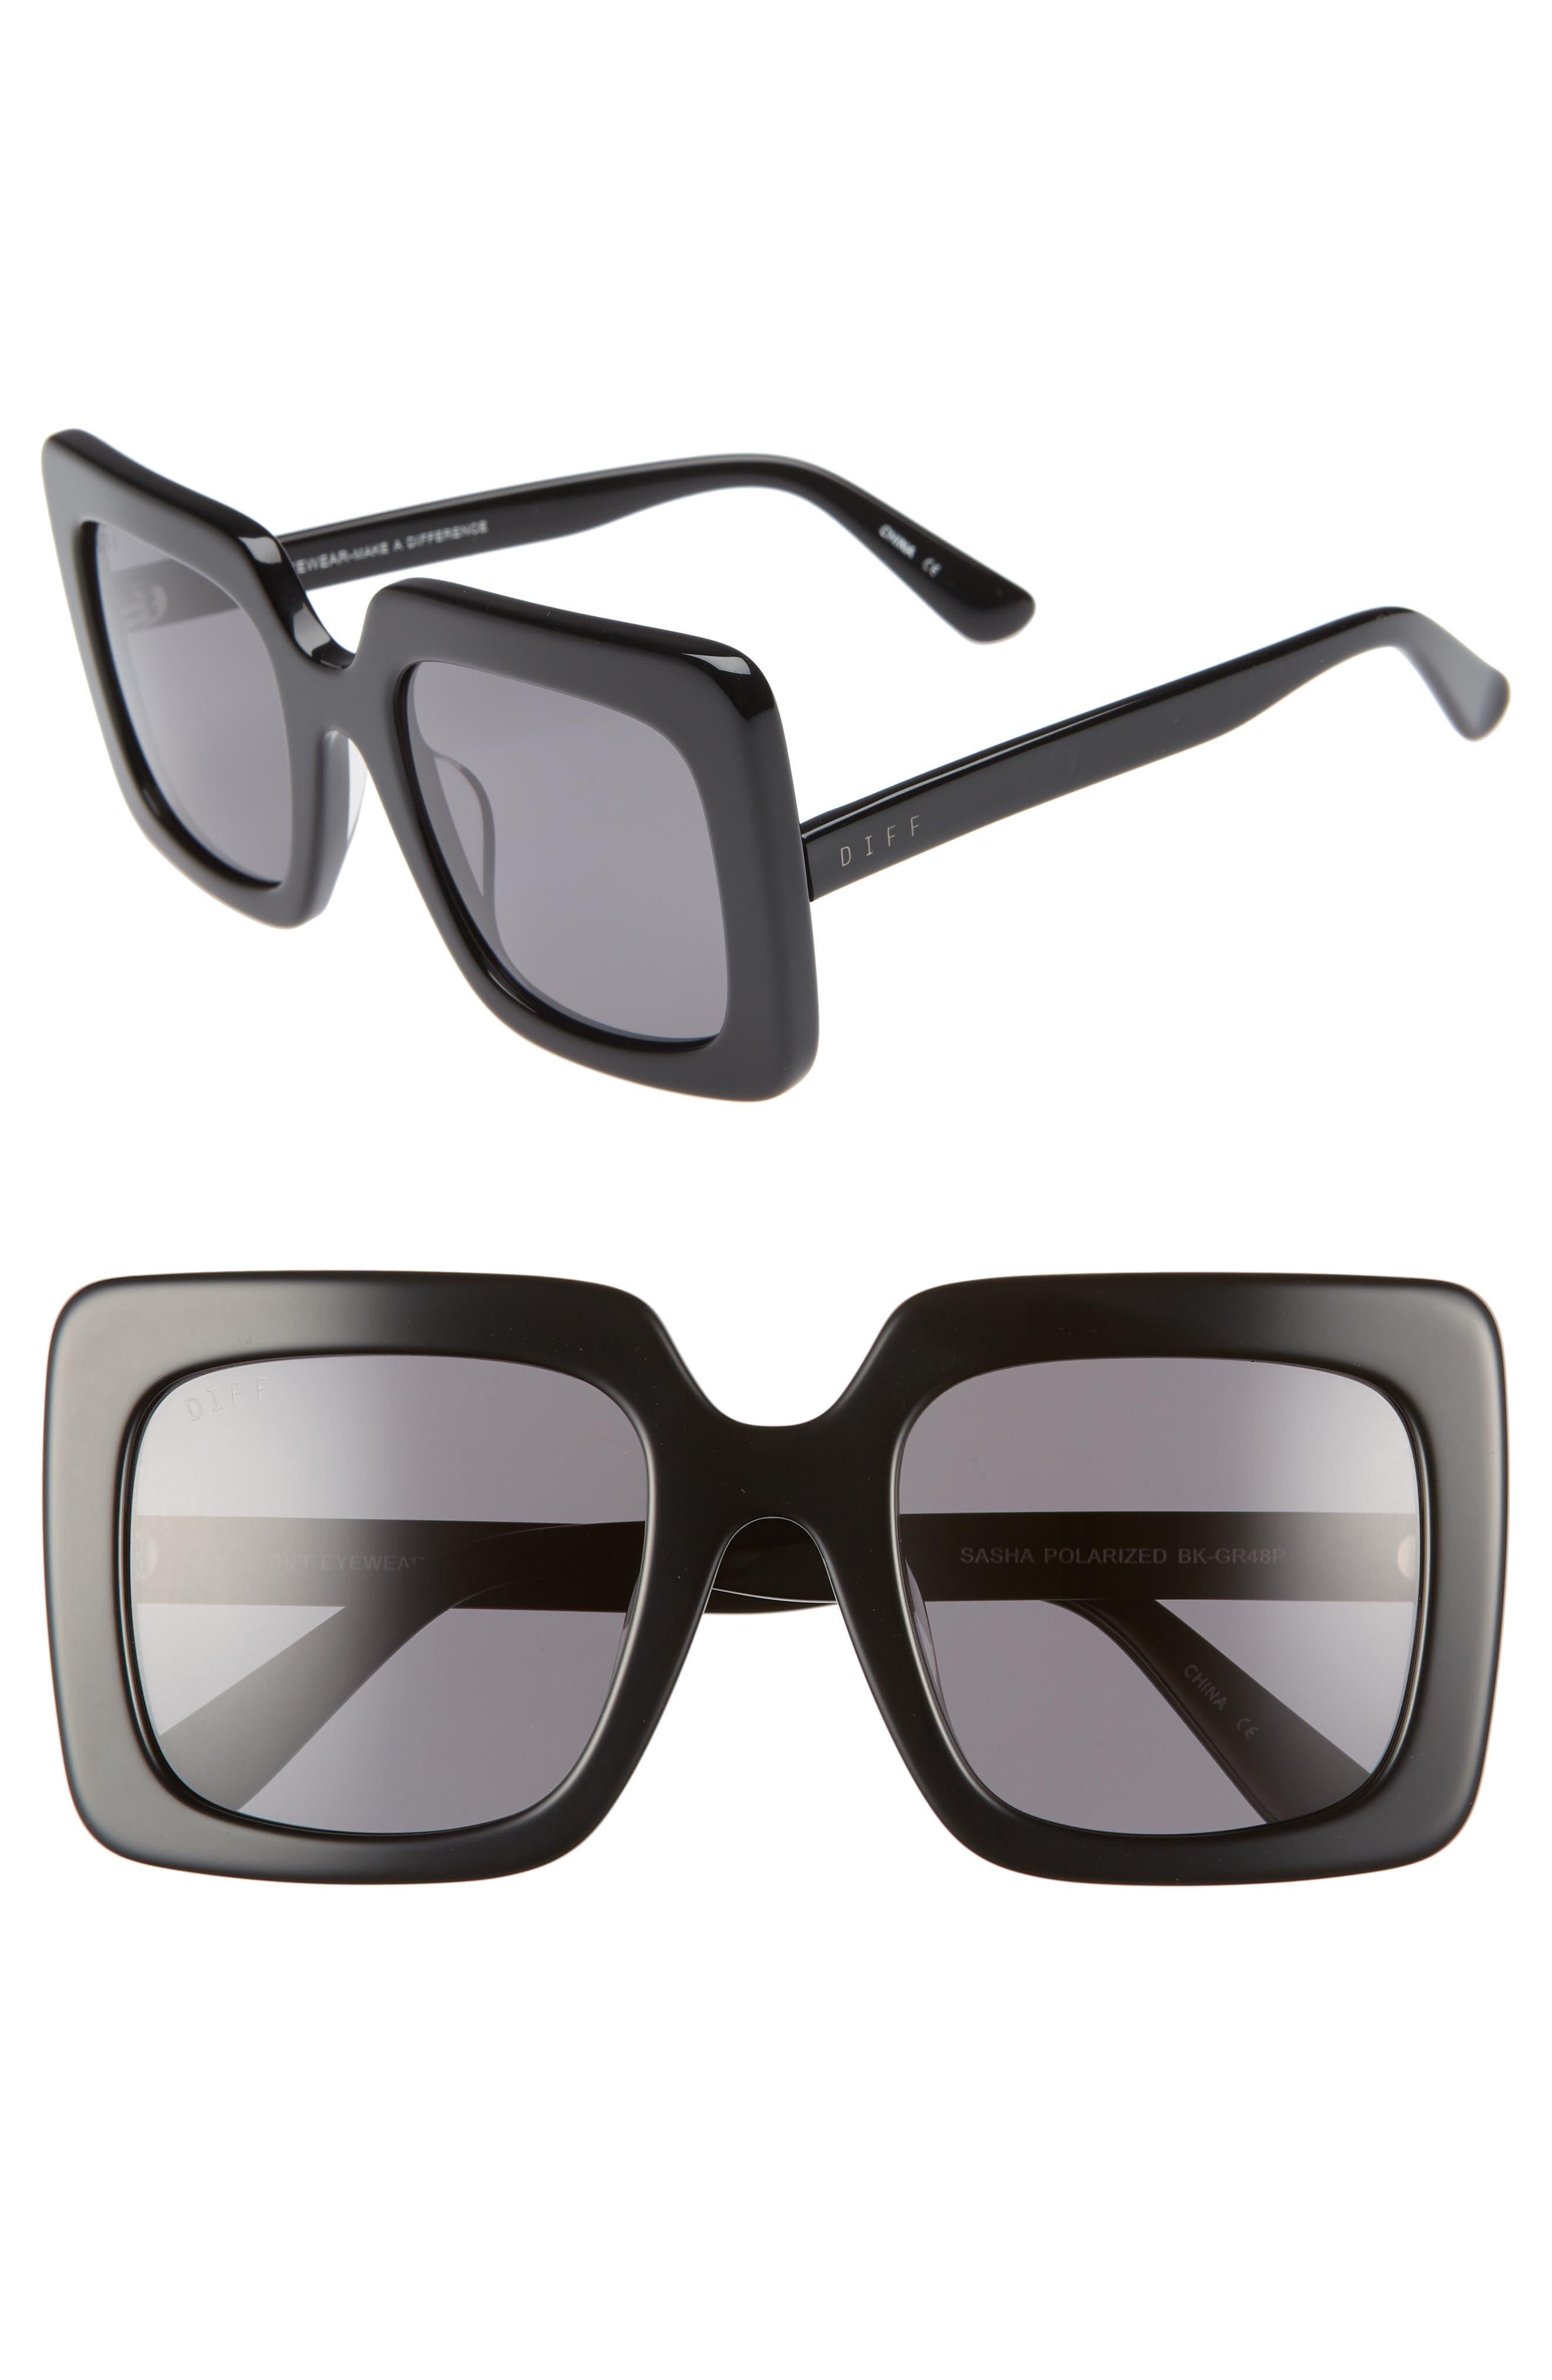 Sasha 53mm Polarized Sunglasses,                             Main thumbnail 1, color,                             BLACK/ GREY